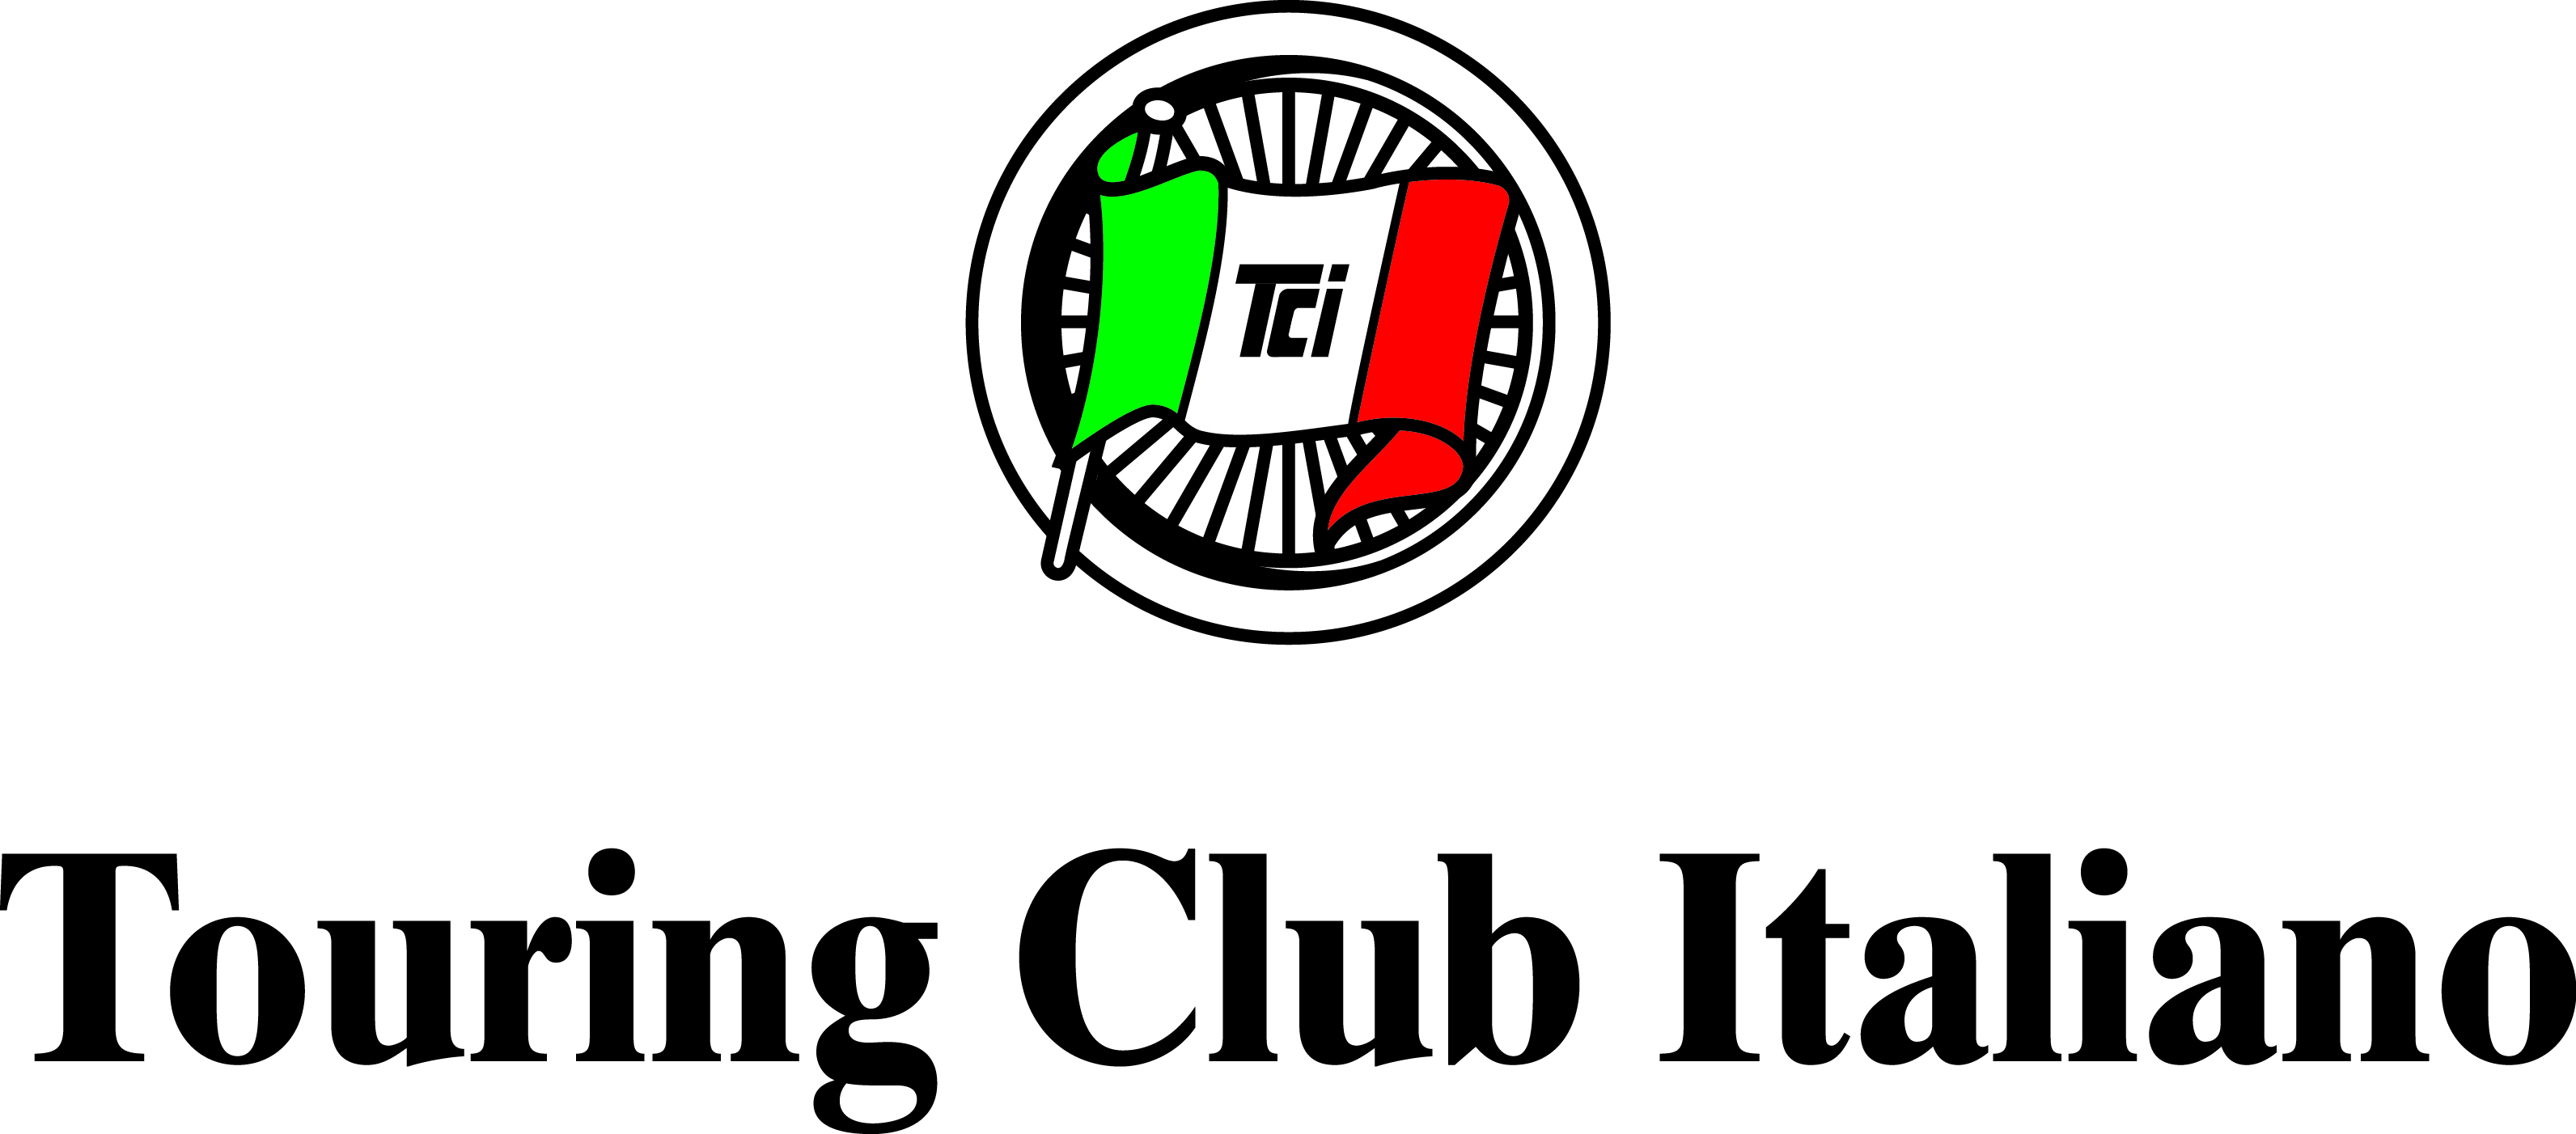 touring club TCI